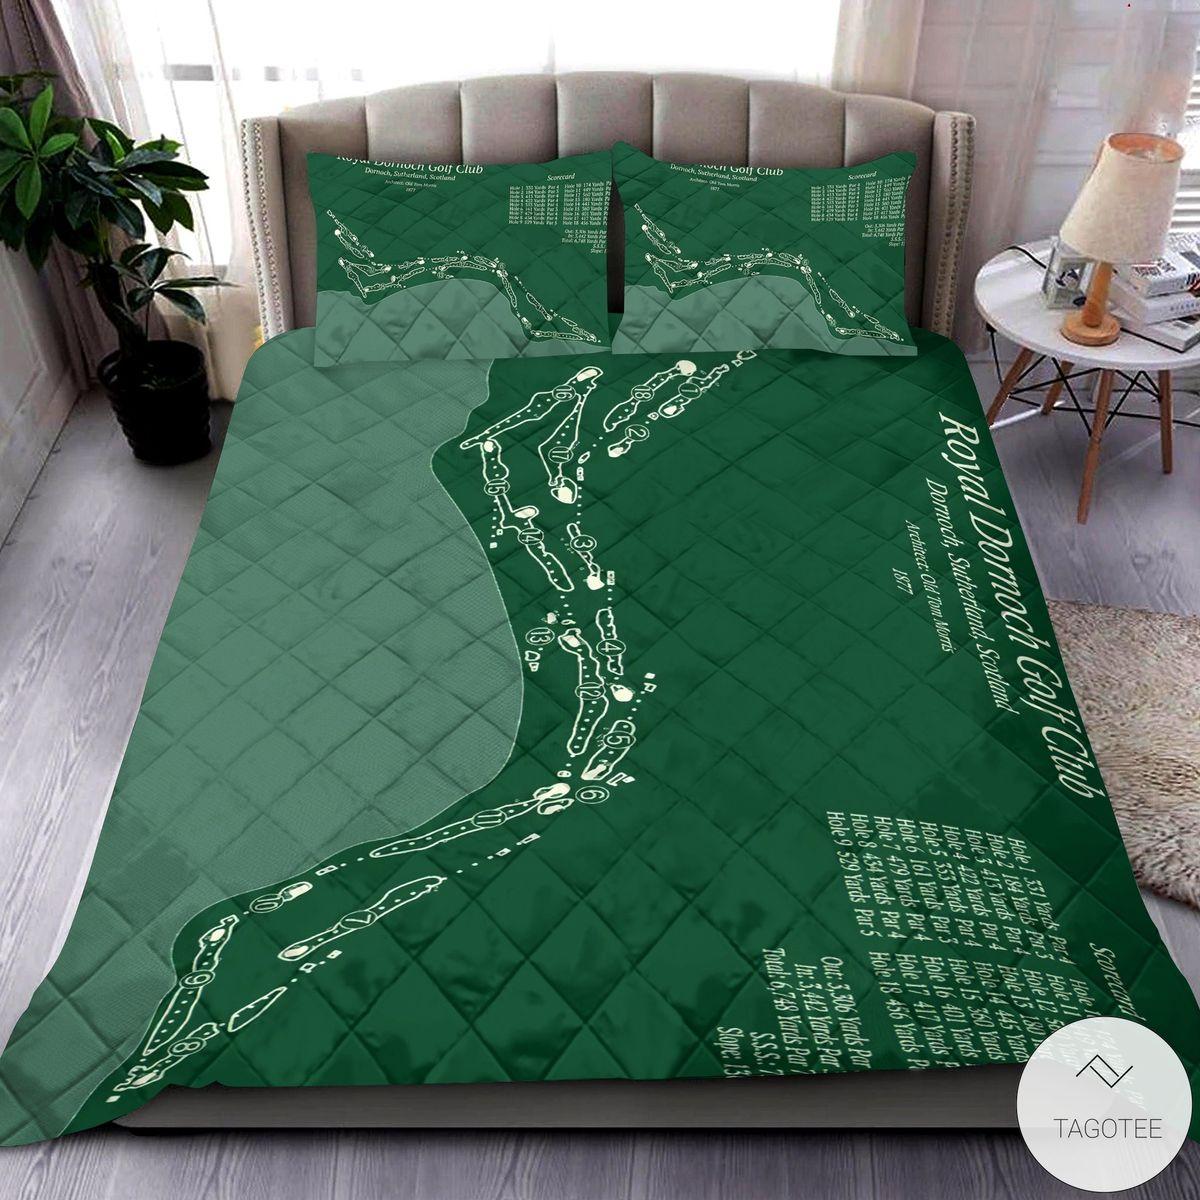 Royal Dornoch Golf Club 3D Quilt Bedding Set